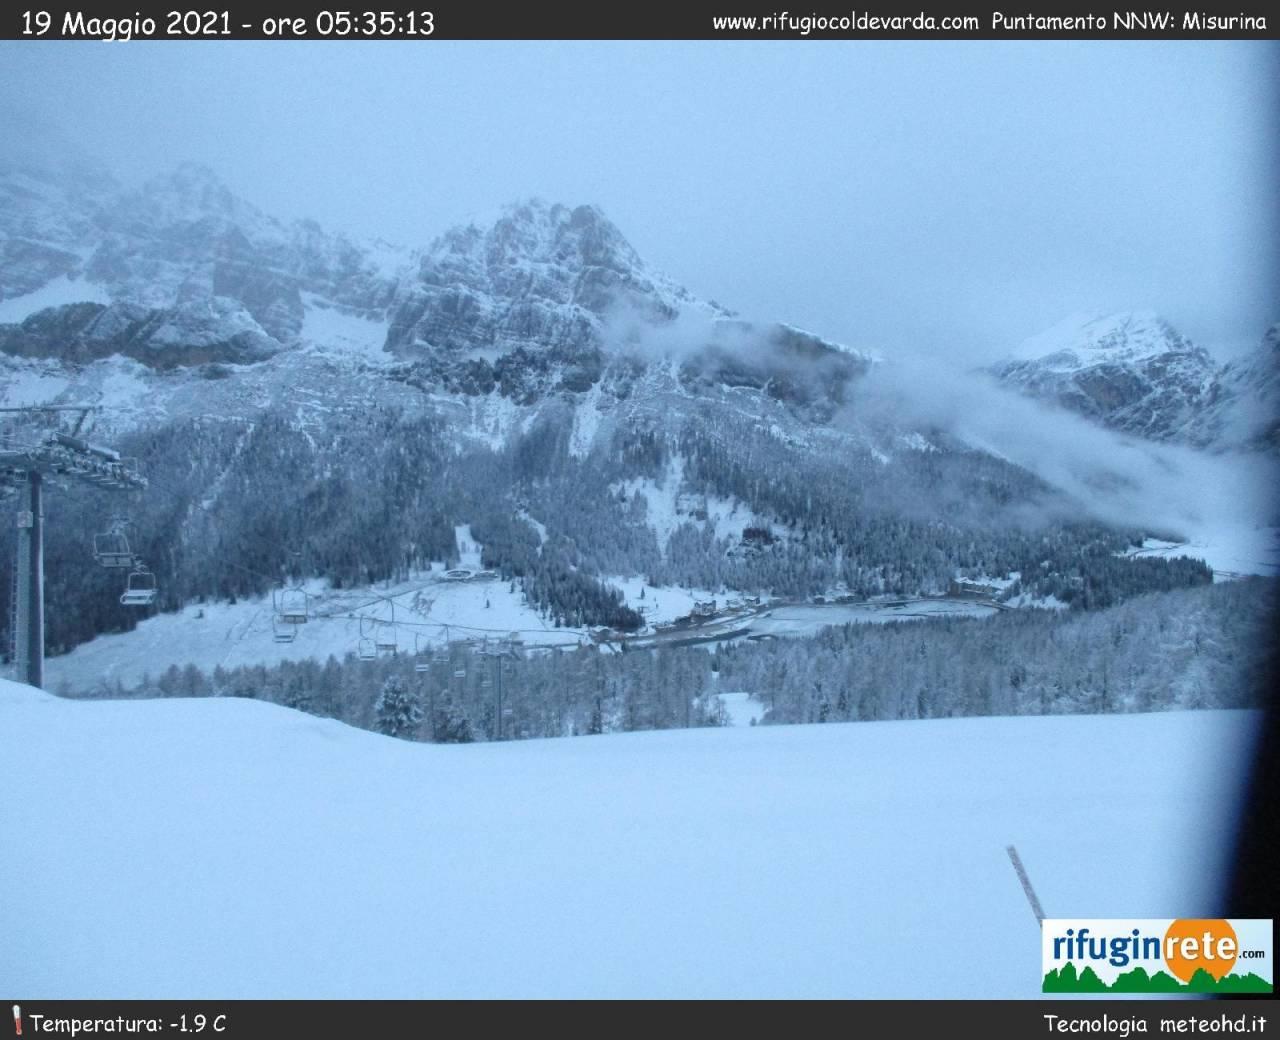 Rifugio Coldevarda (BL)